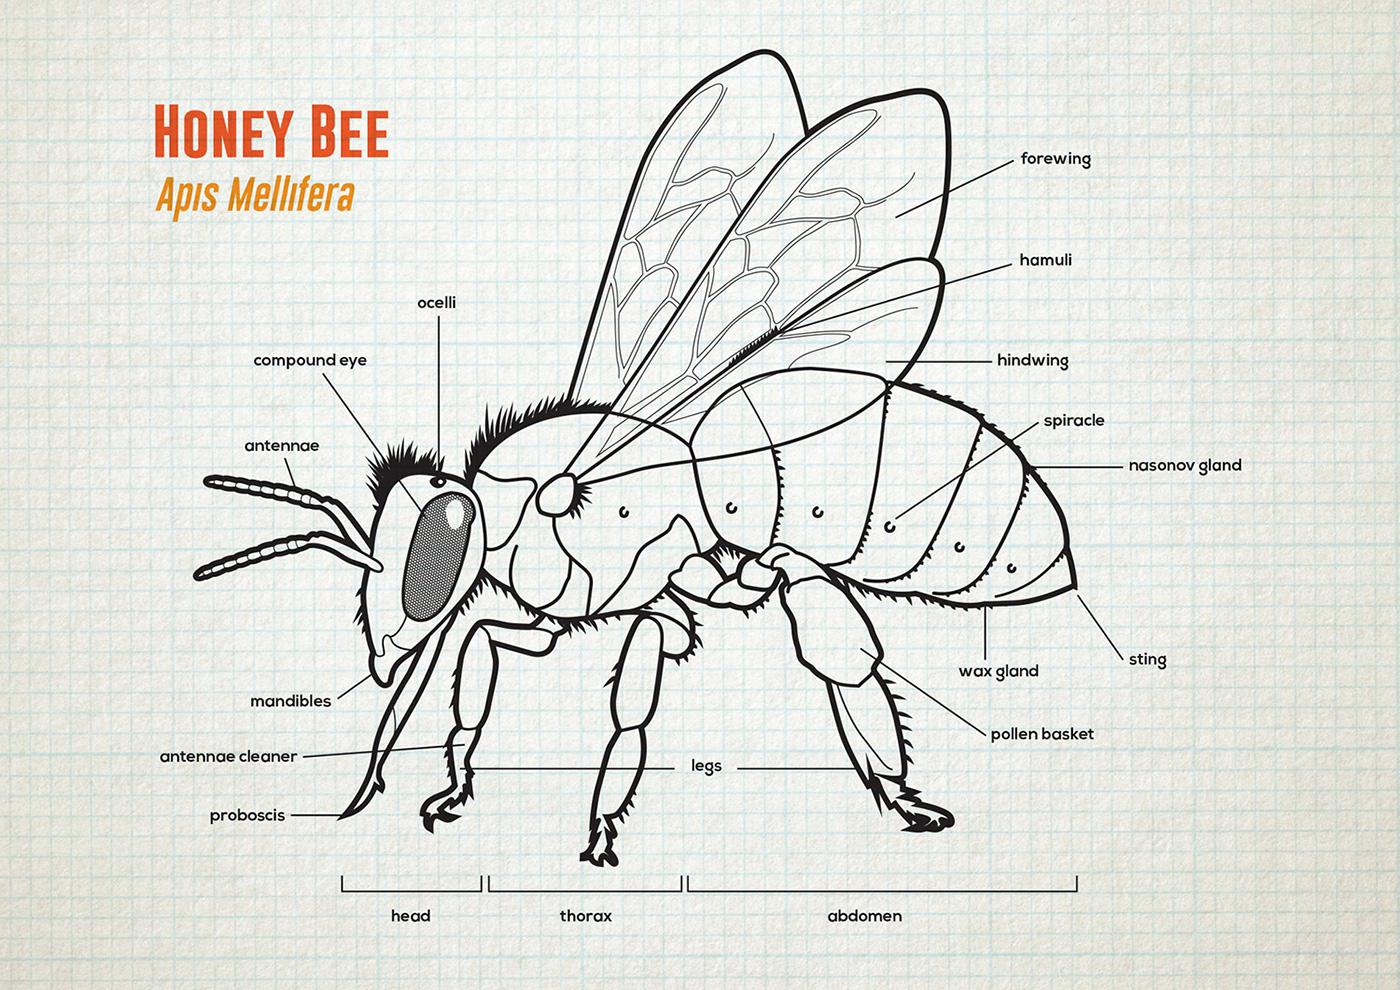 Honey Bee Anatomy Amp Lifecycle On Behance